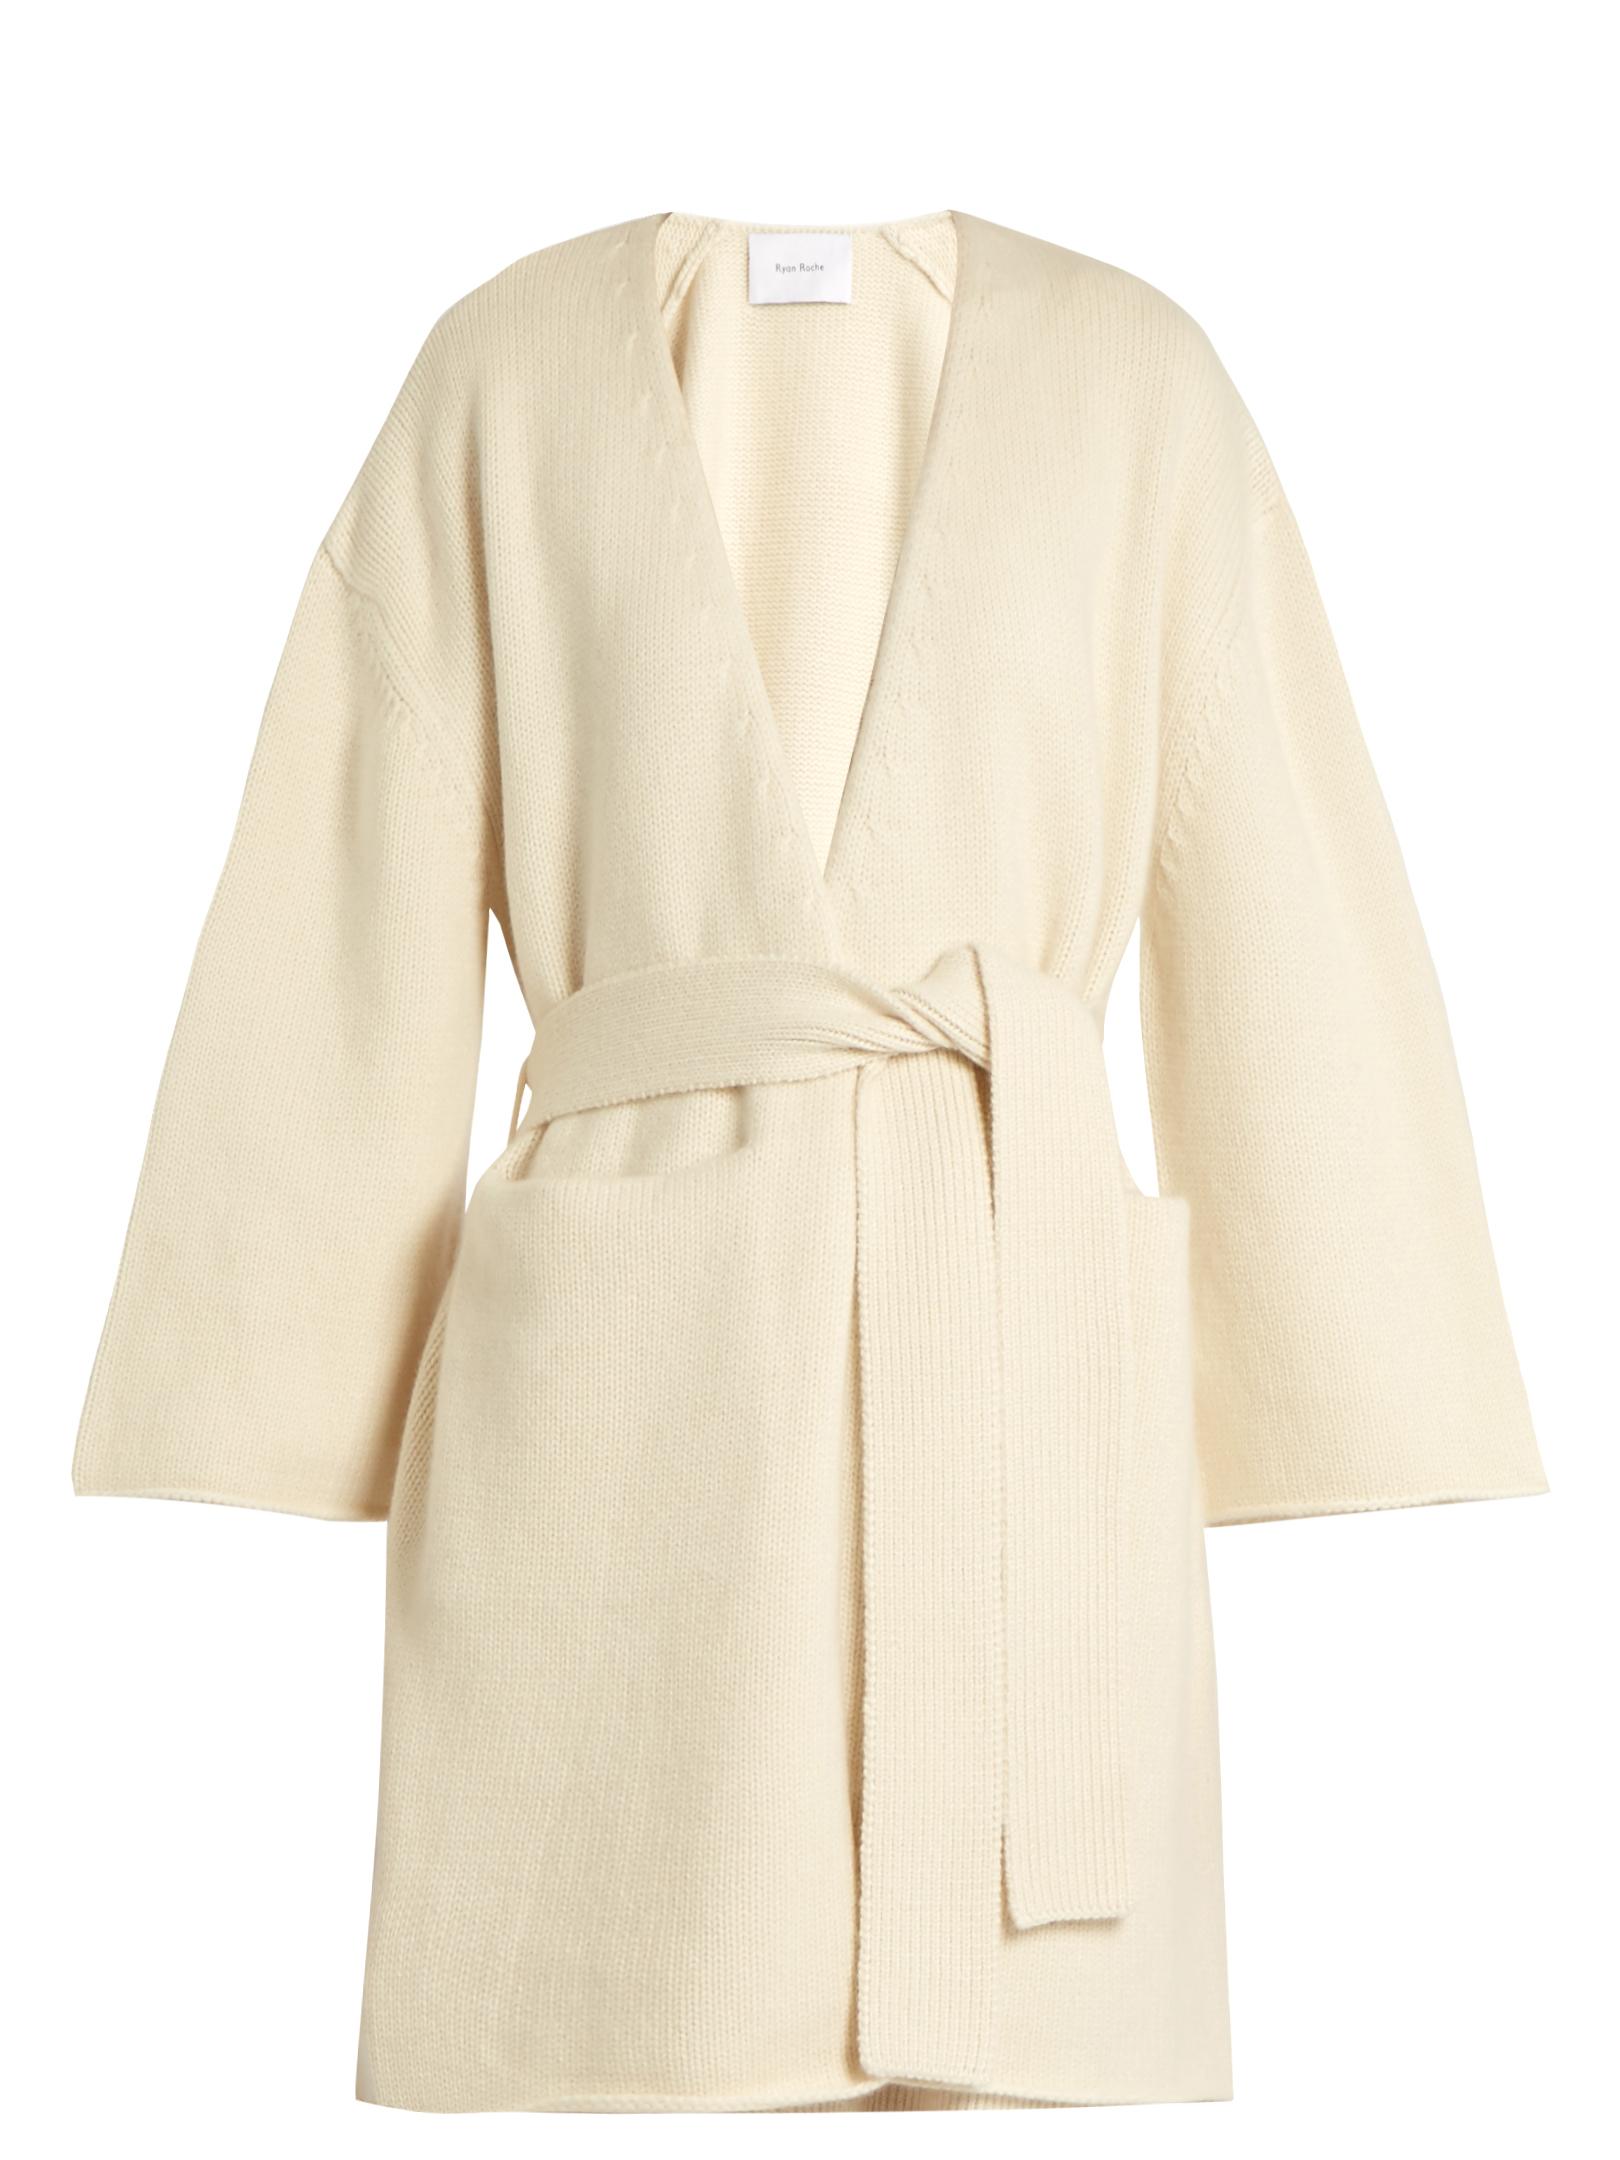 Tie-waist cashmere cardigan